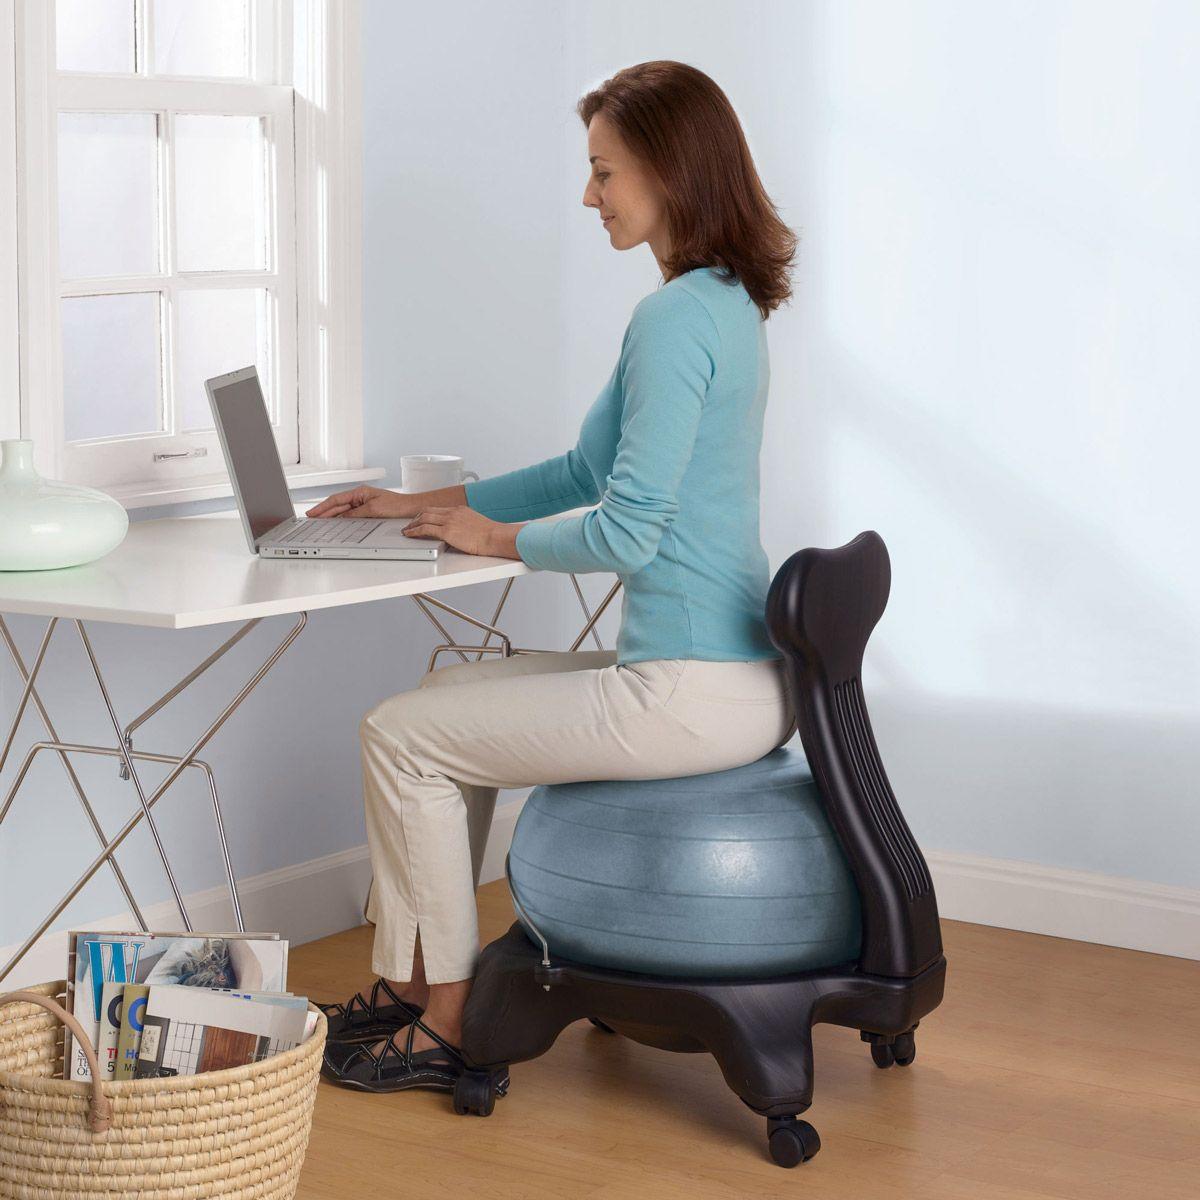 Balance Ball Love BureauFauteuil ChairProducts I Chaise VpUSMqzG